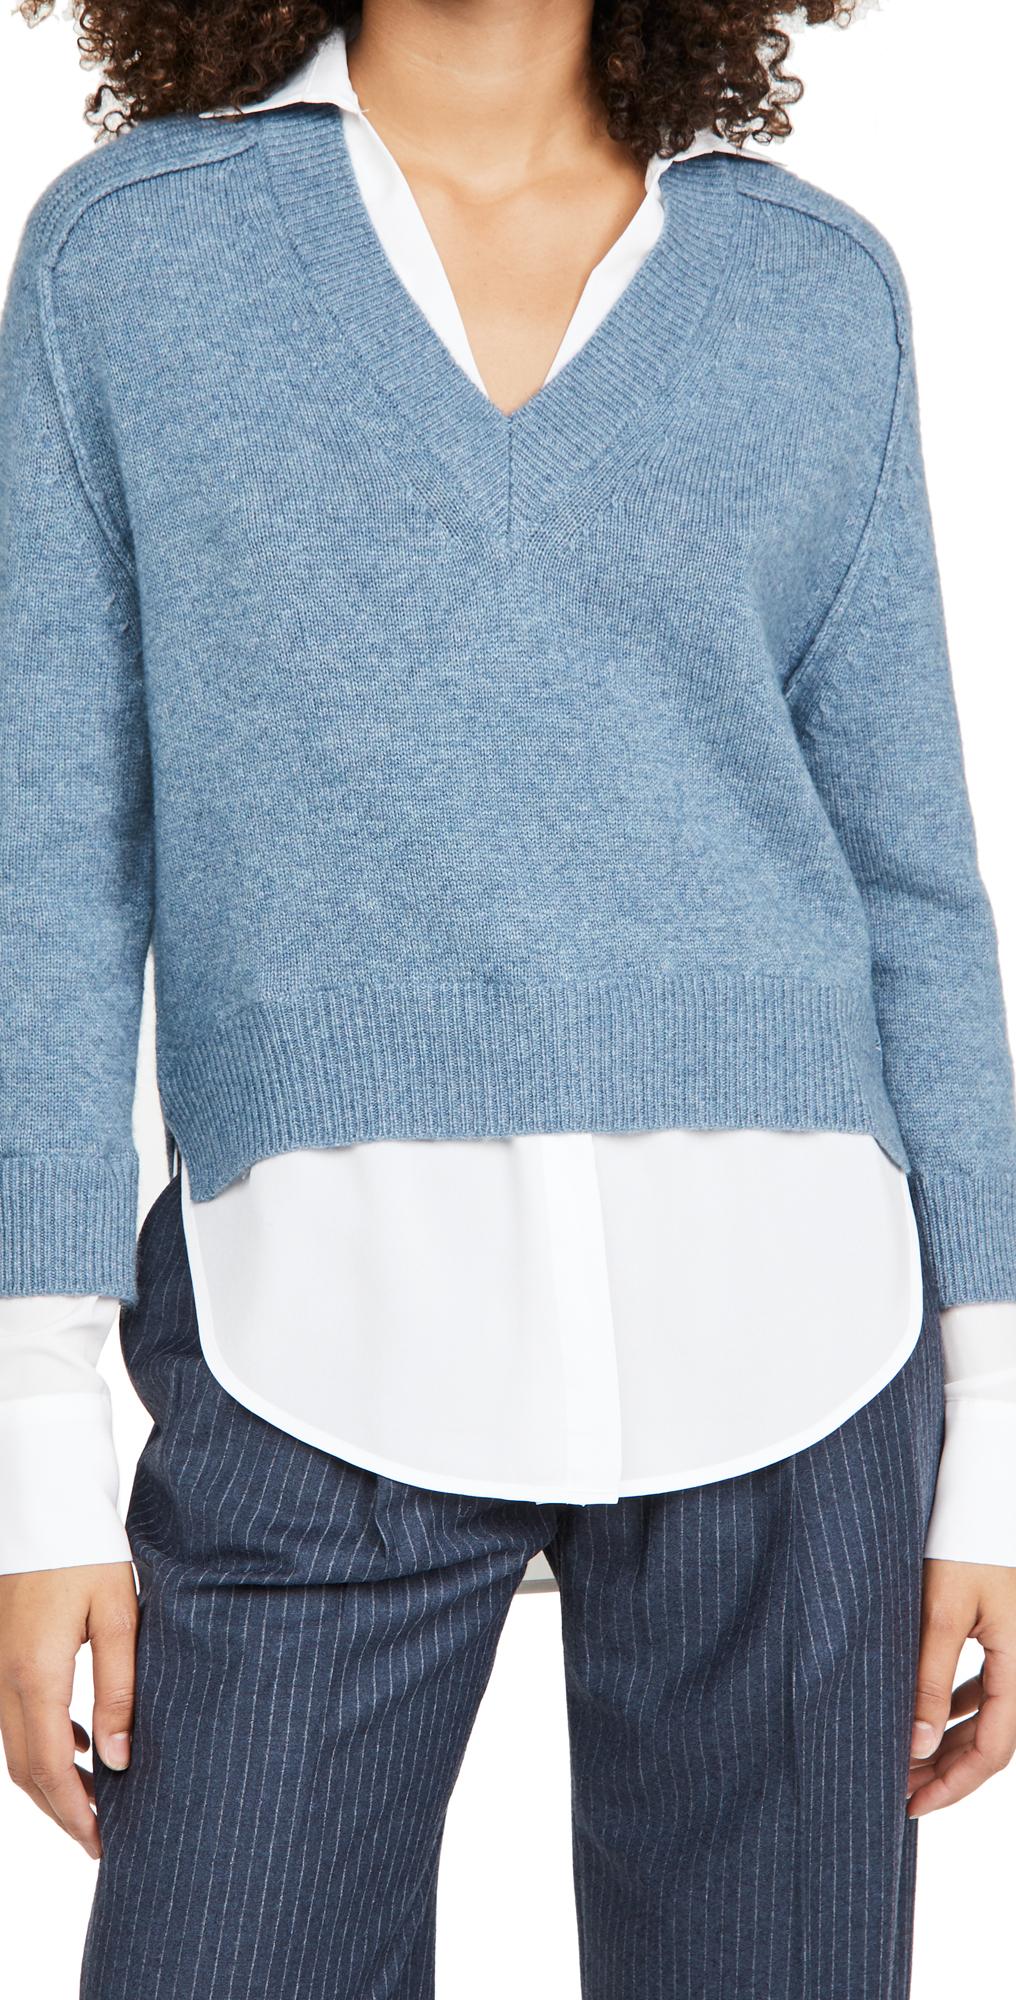 Alum V Neck Layered Looker Sweater